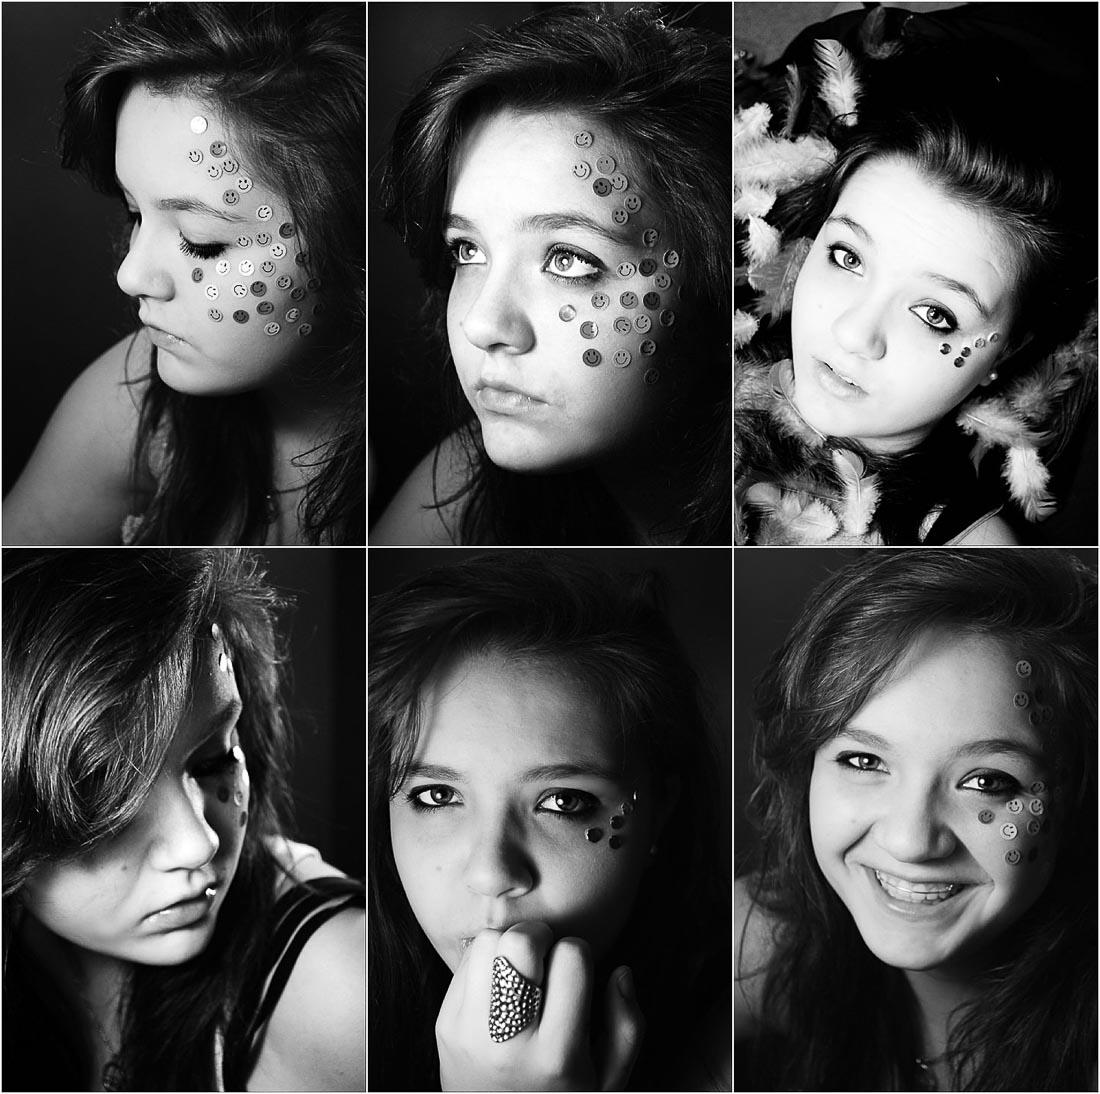 Ashley, Stylized Headshot Portrait Session by Danielle Doepke Photography, Located in Fort Wayne, Indiana